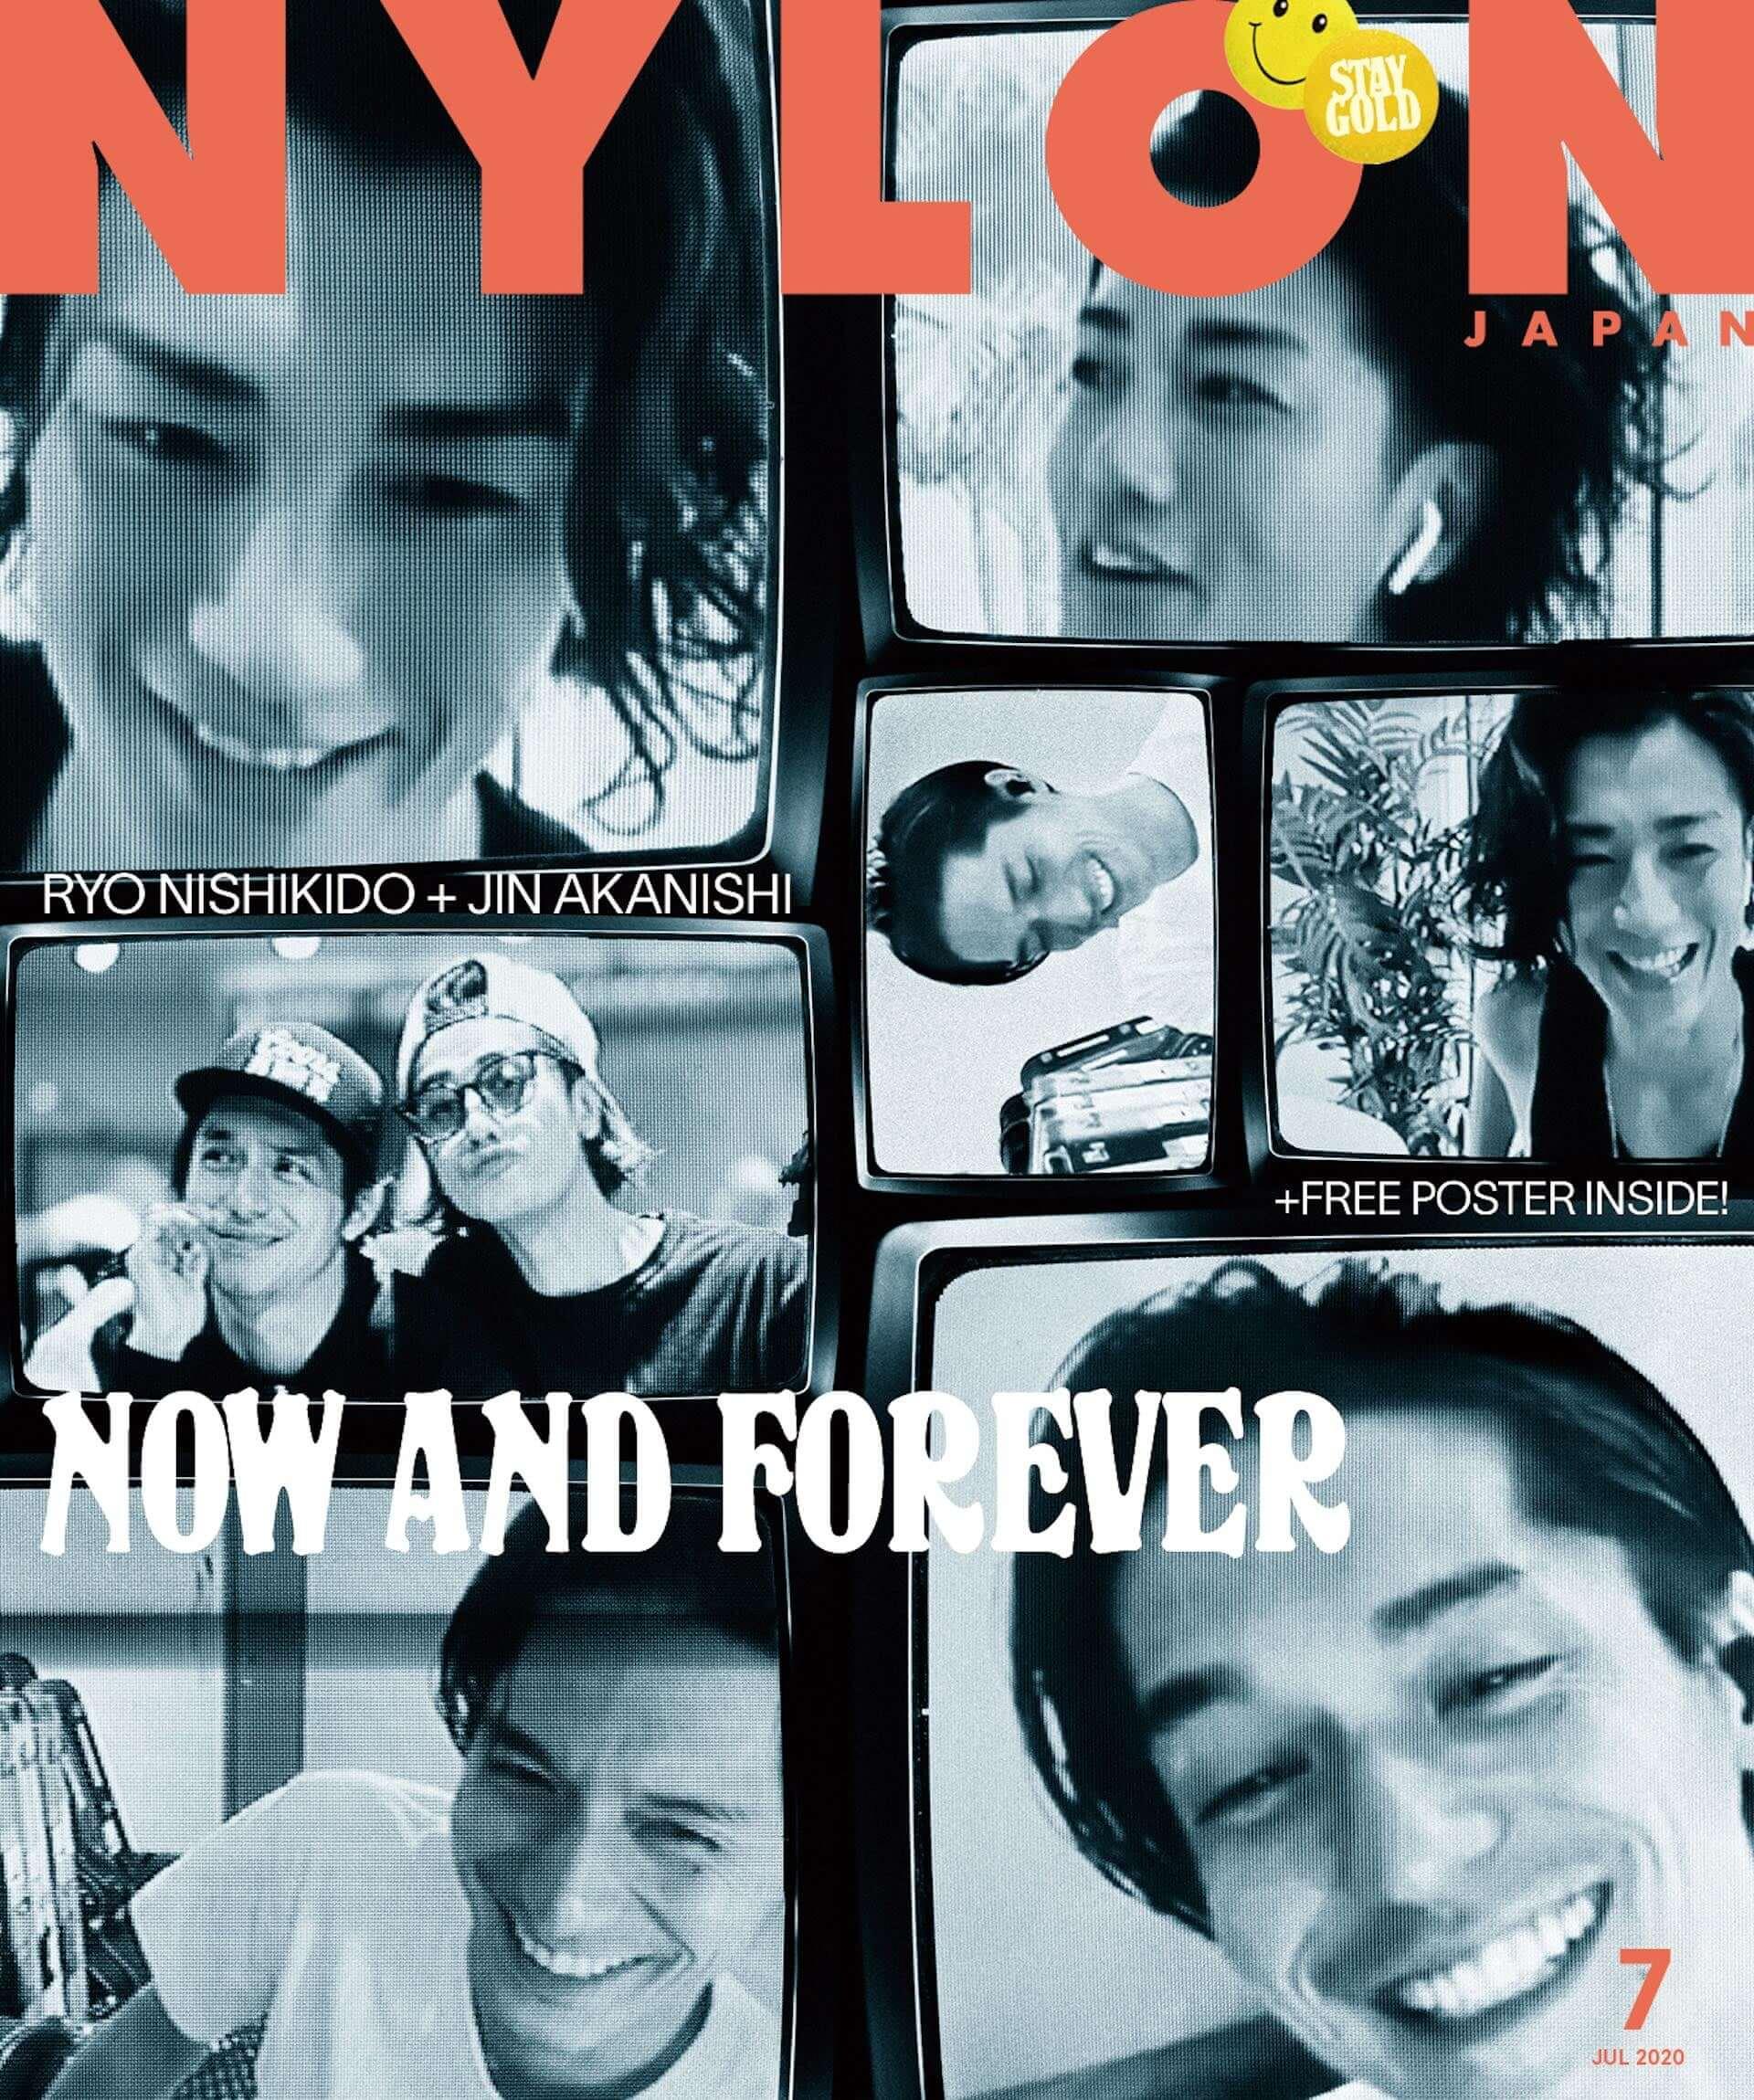 『NYLON JAPAN』初登場の赤西仁と錦戸亮が本音を語る!1万字インタビューやスペシャルな特集が組まれた最新号が発売 lf200522_nylon_01-1920x2299